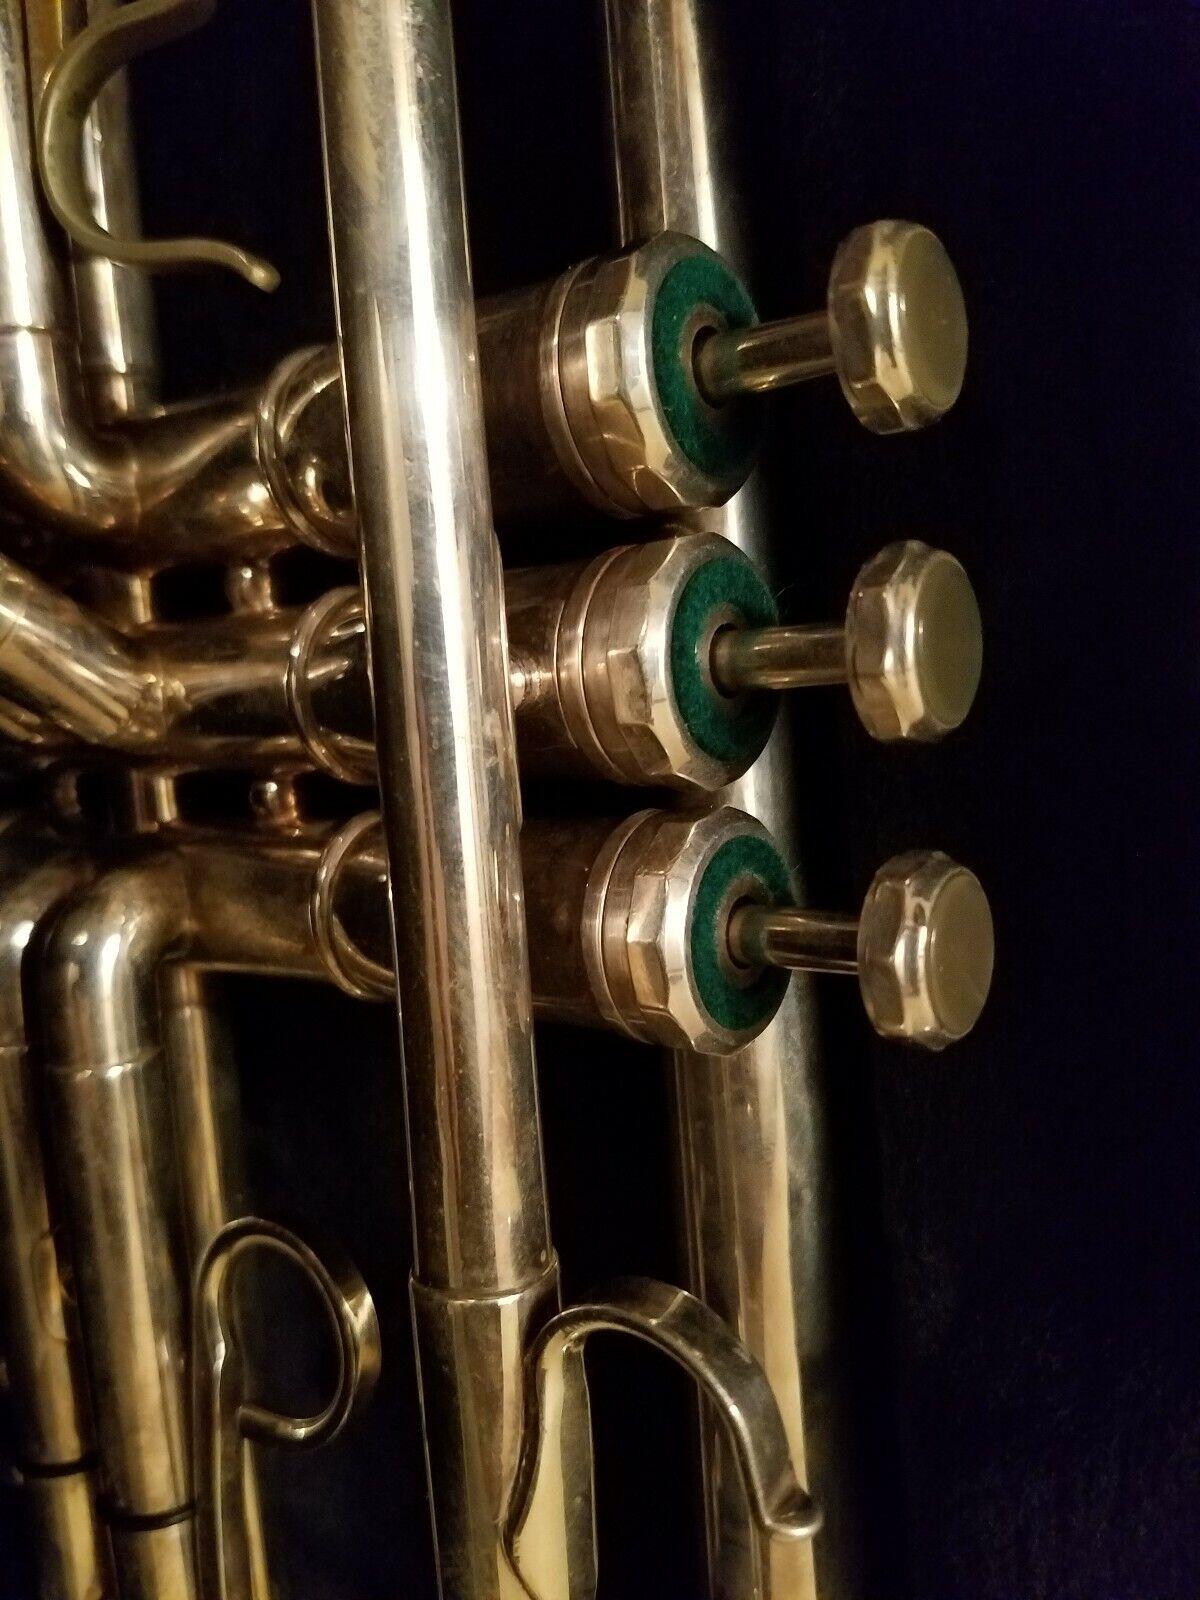 Olds Super Star Trumpet Fullerton CA with case